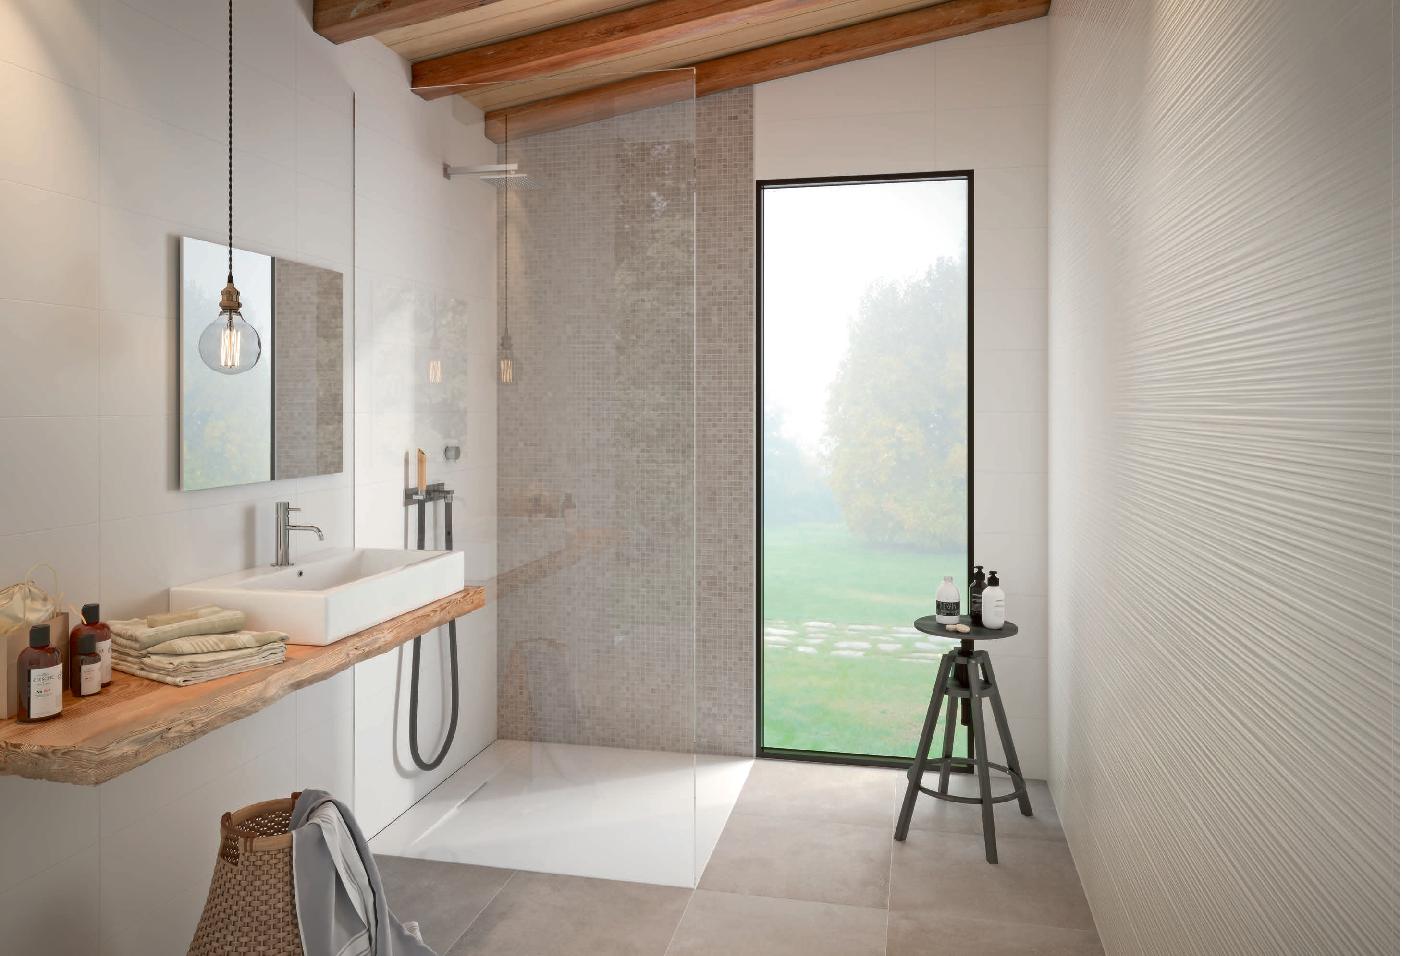 Marazzi Absolute White Strutturato Fiber 3d Sat 25x76 Cm M022 Best Bathroom Designs Bathroom Design Bathroom Trends